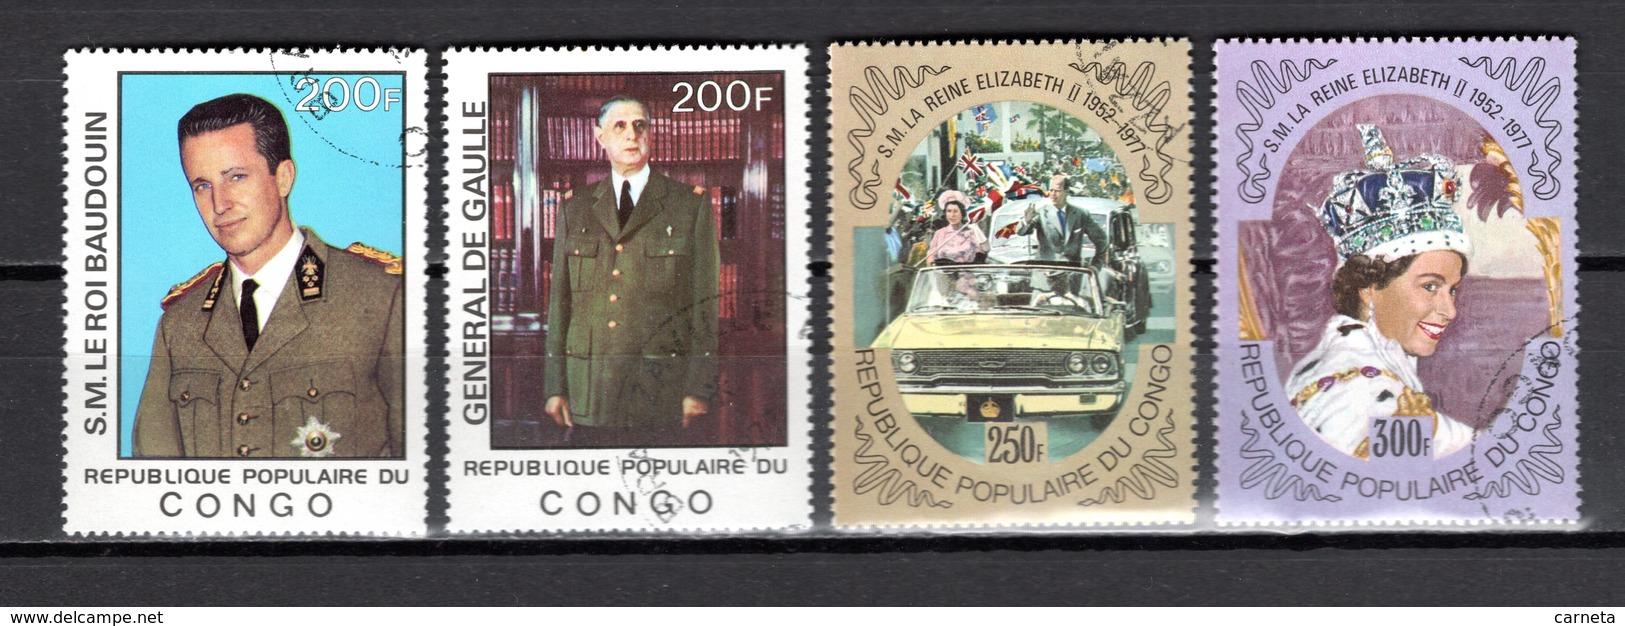 CONGO   N° 476 à 479  OBLITERES  COTE  3.50€  GENERAL DE GAULLE   REINE  ROI - Congo - Brazzaville